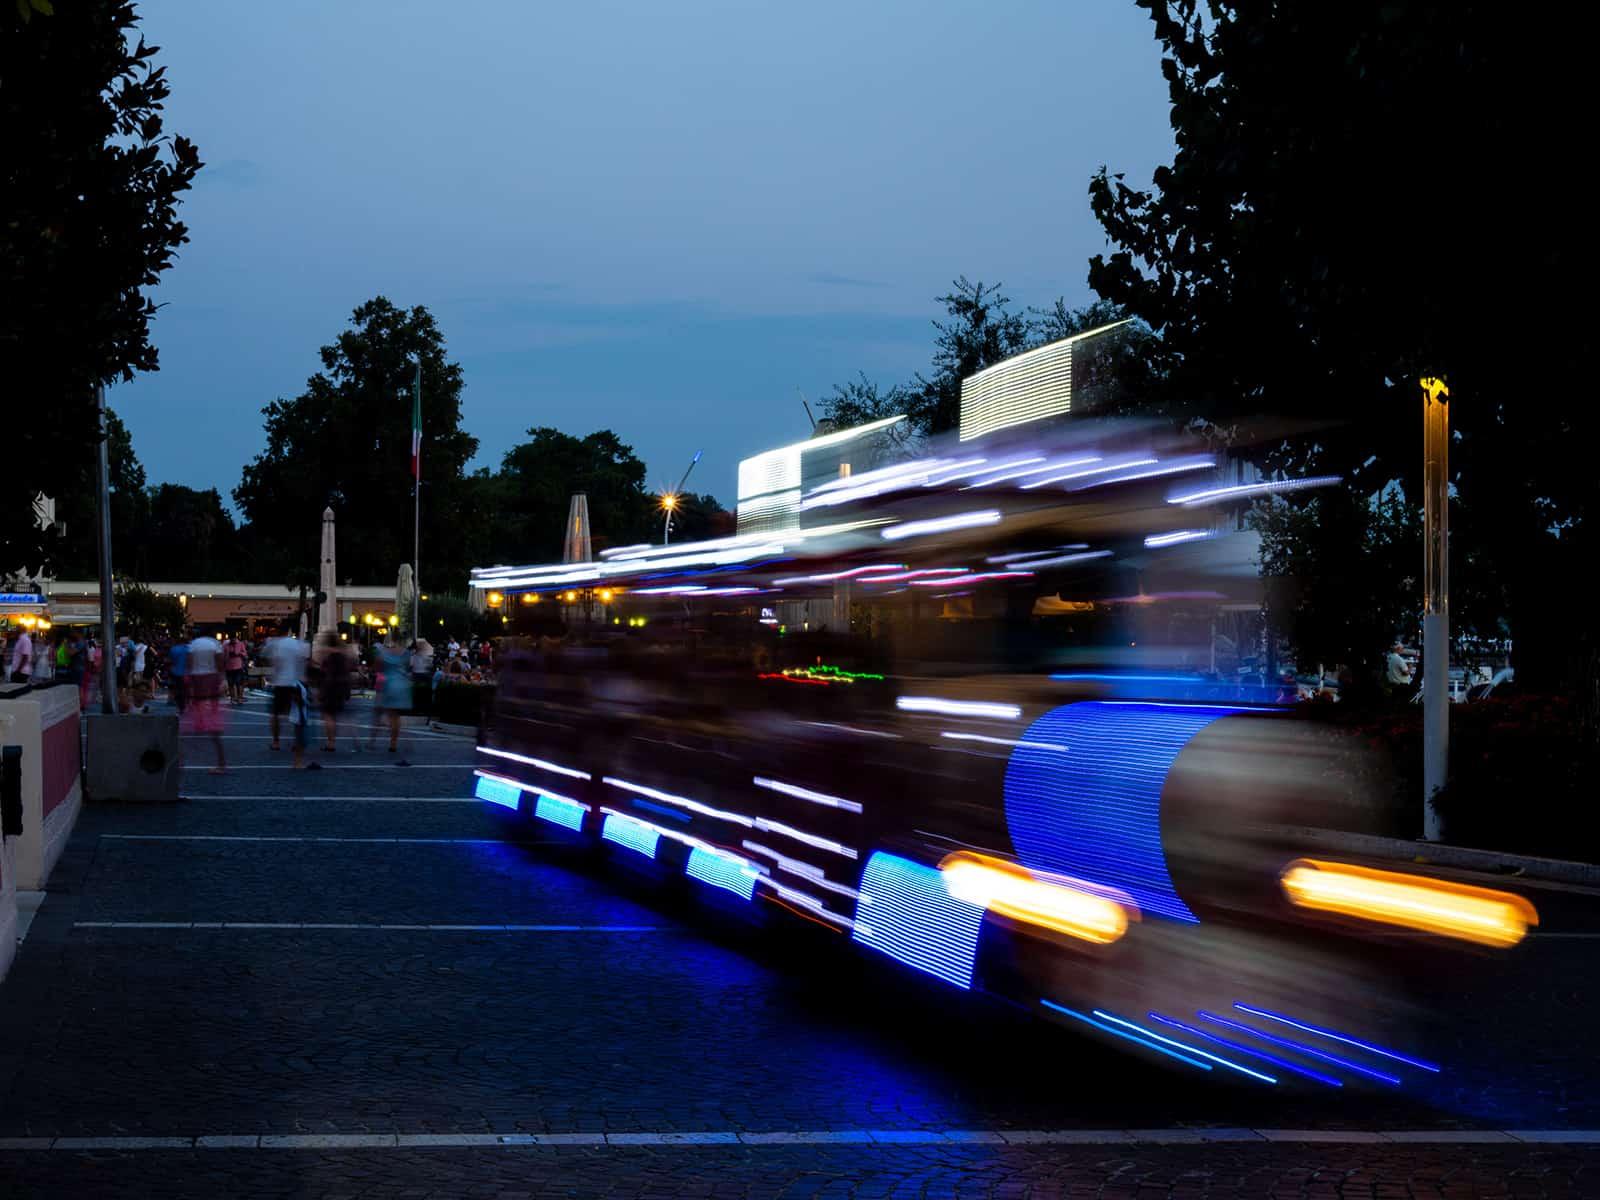 Touristenbahn in Bardolino